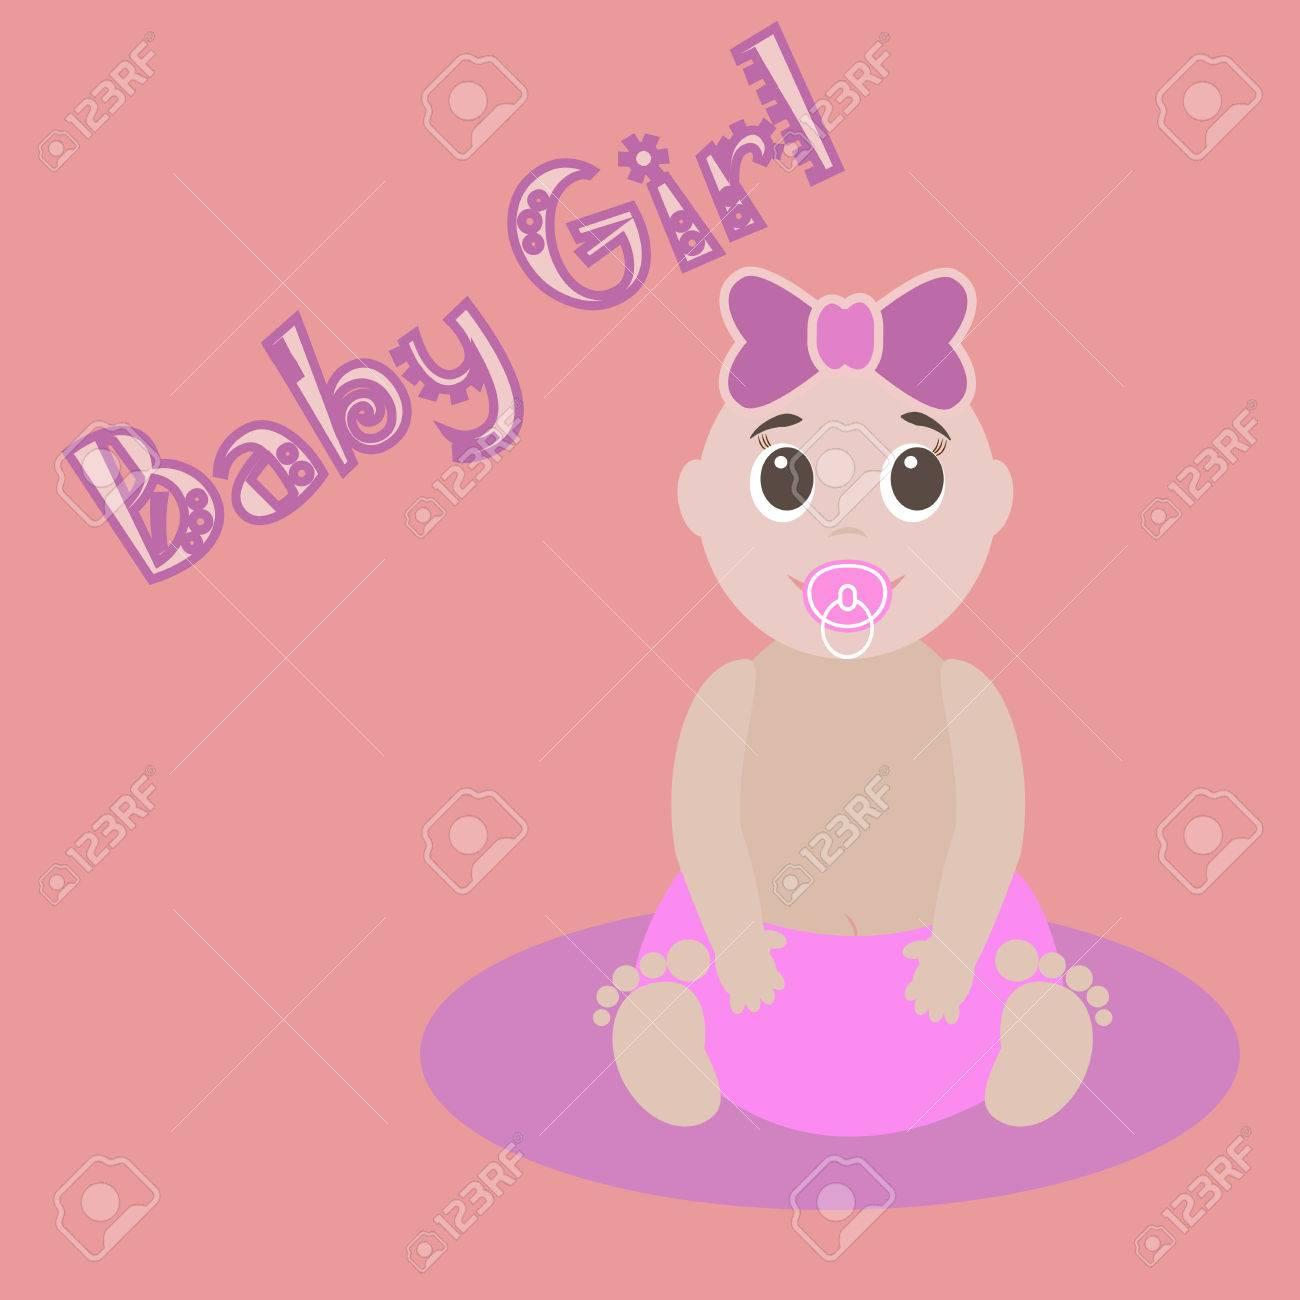 Cute Graphic For Baby Girl Baby Girlnewborn Lovely Greeting